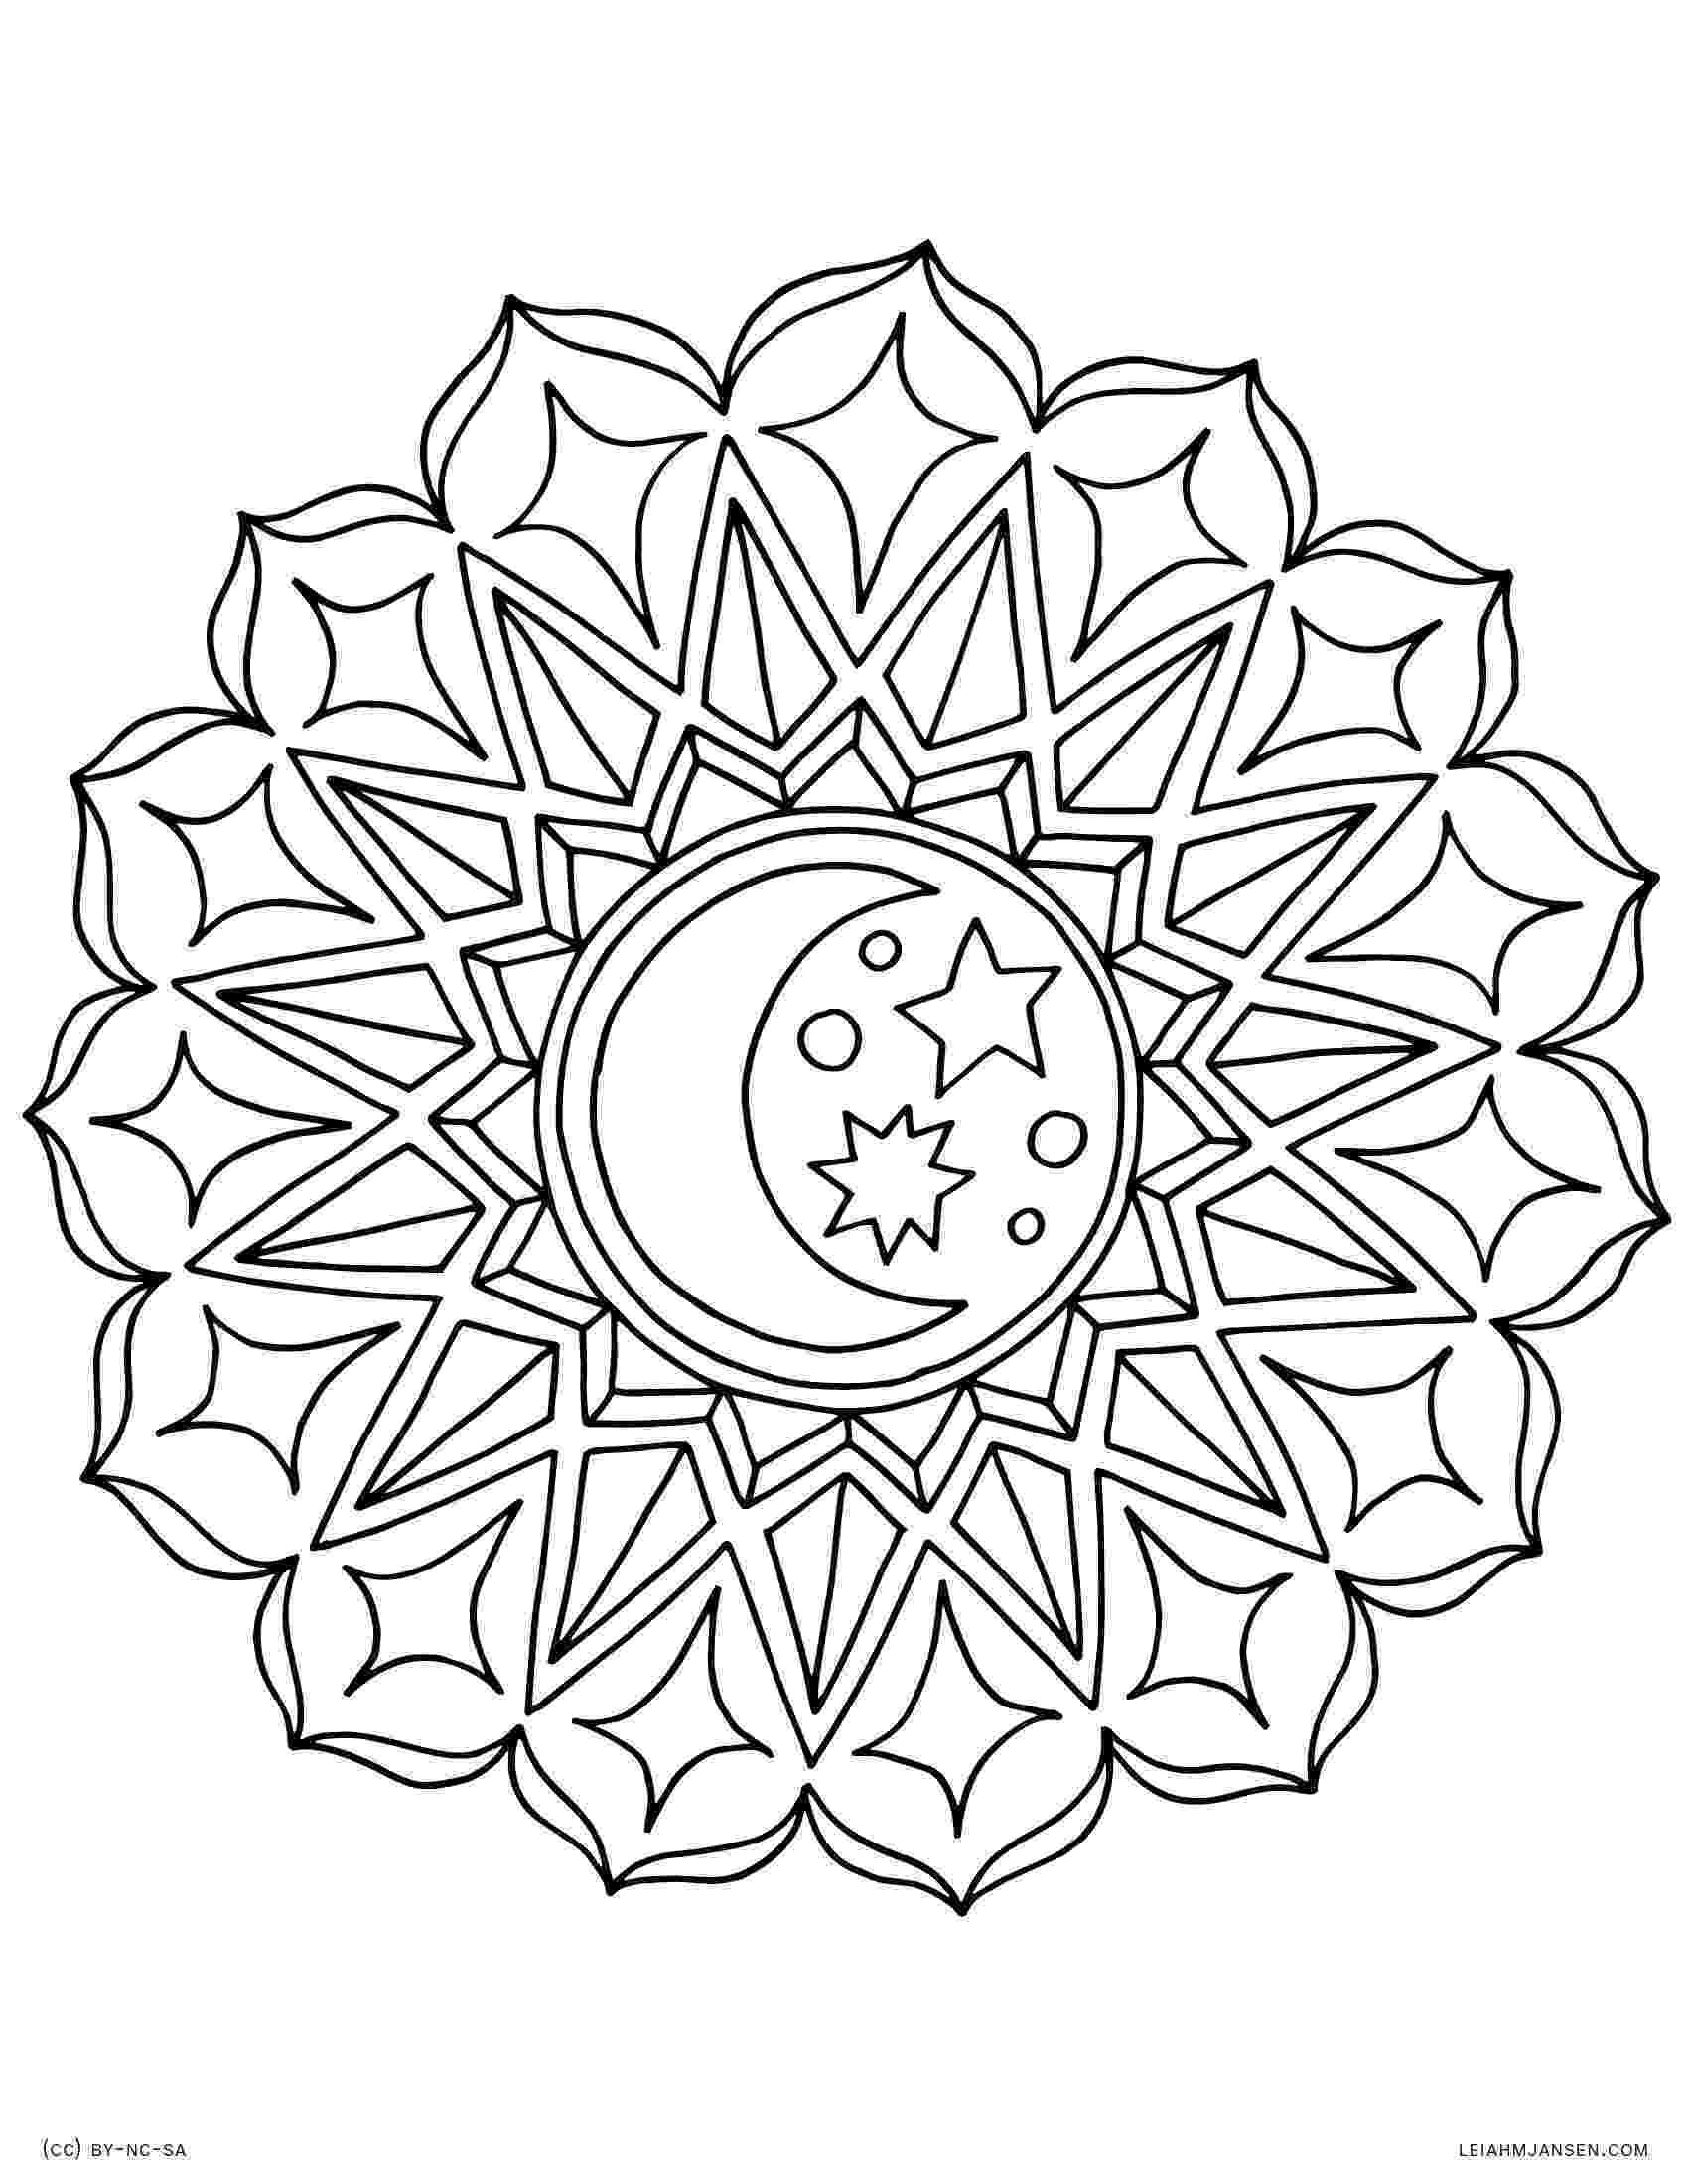 adult mandala coloring pages flower mandala coloring pages best coloring pages for kids adult coloring pages mandala